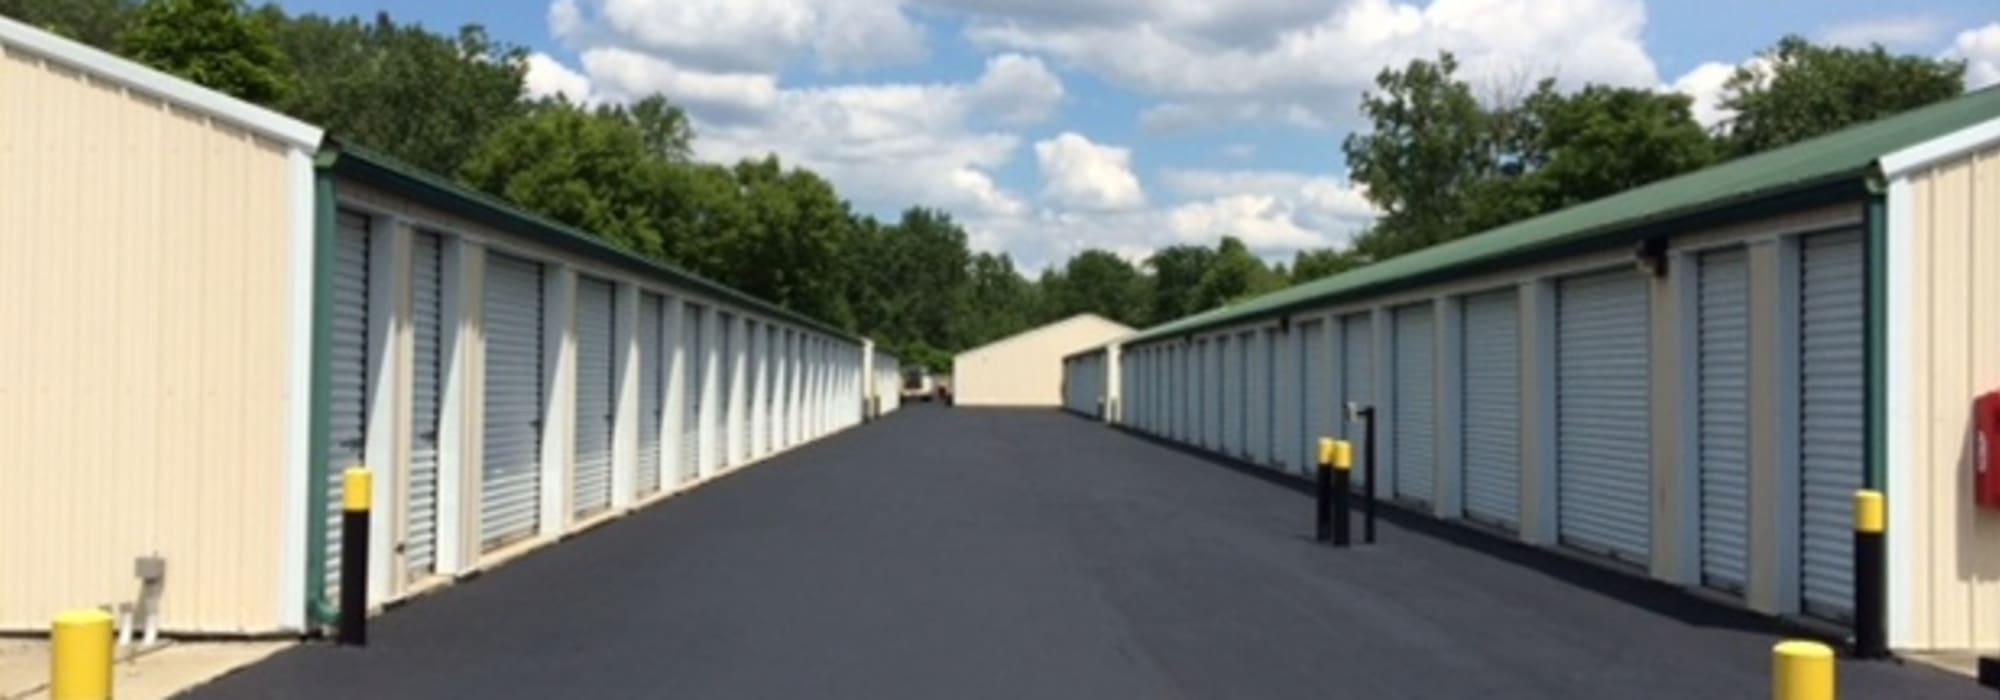 Self storage from Wilson Road Storage in Columbus, Ohio